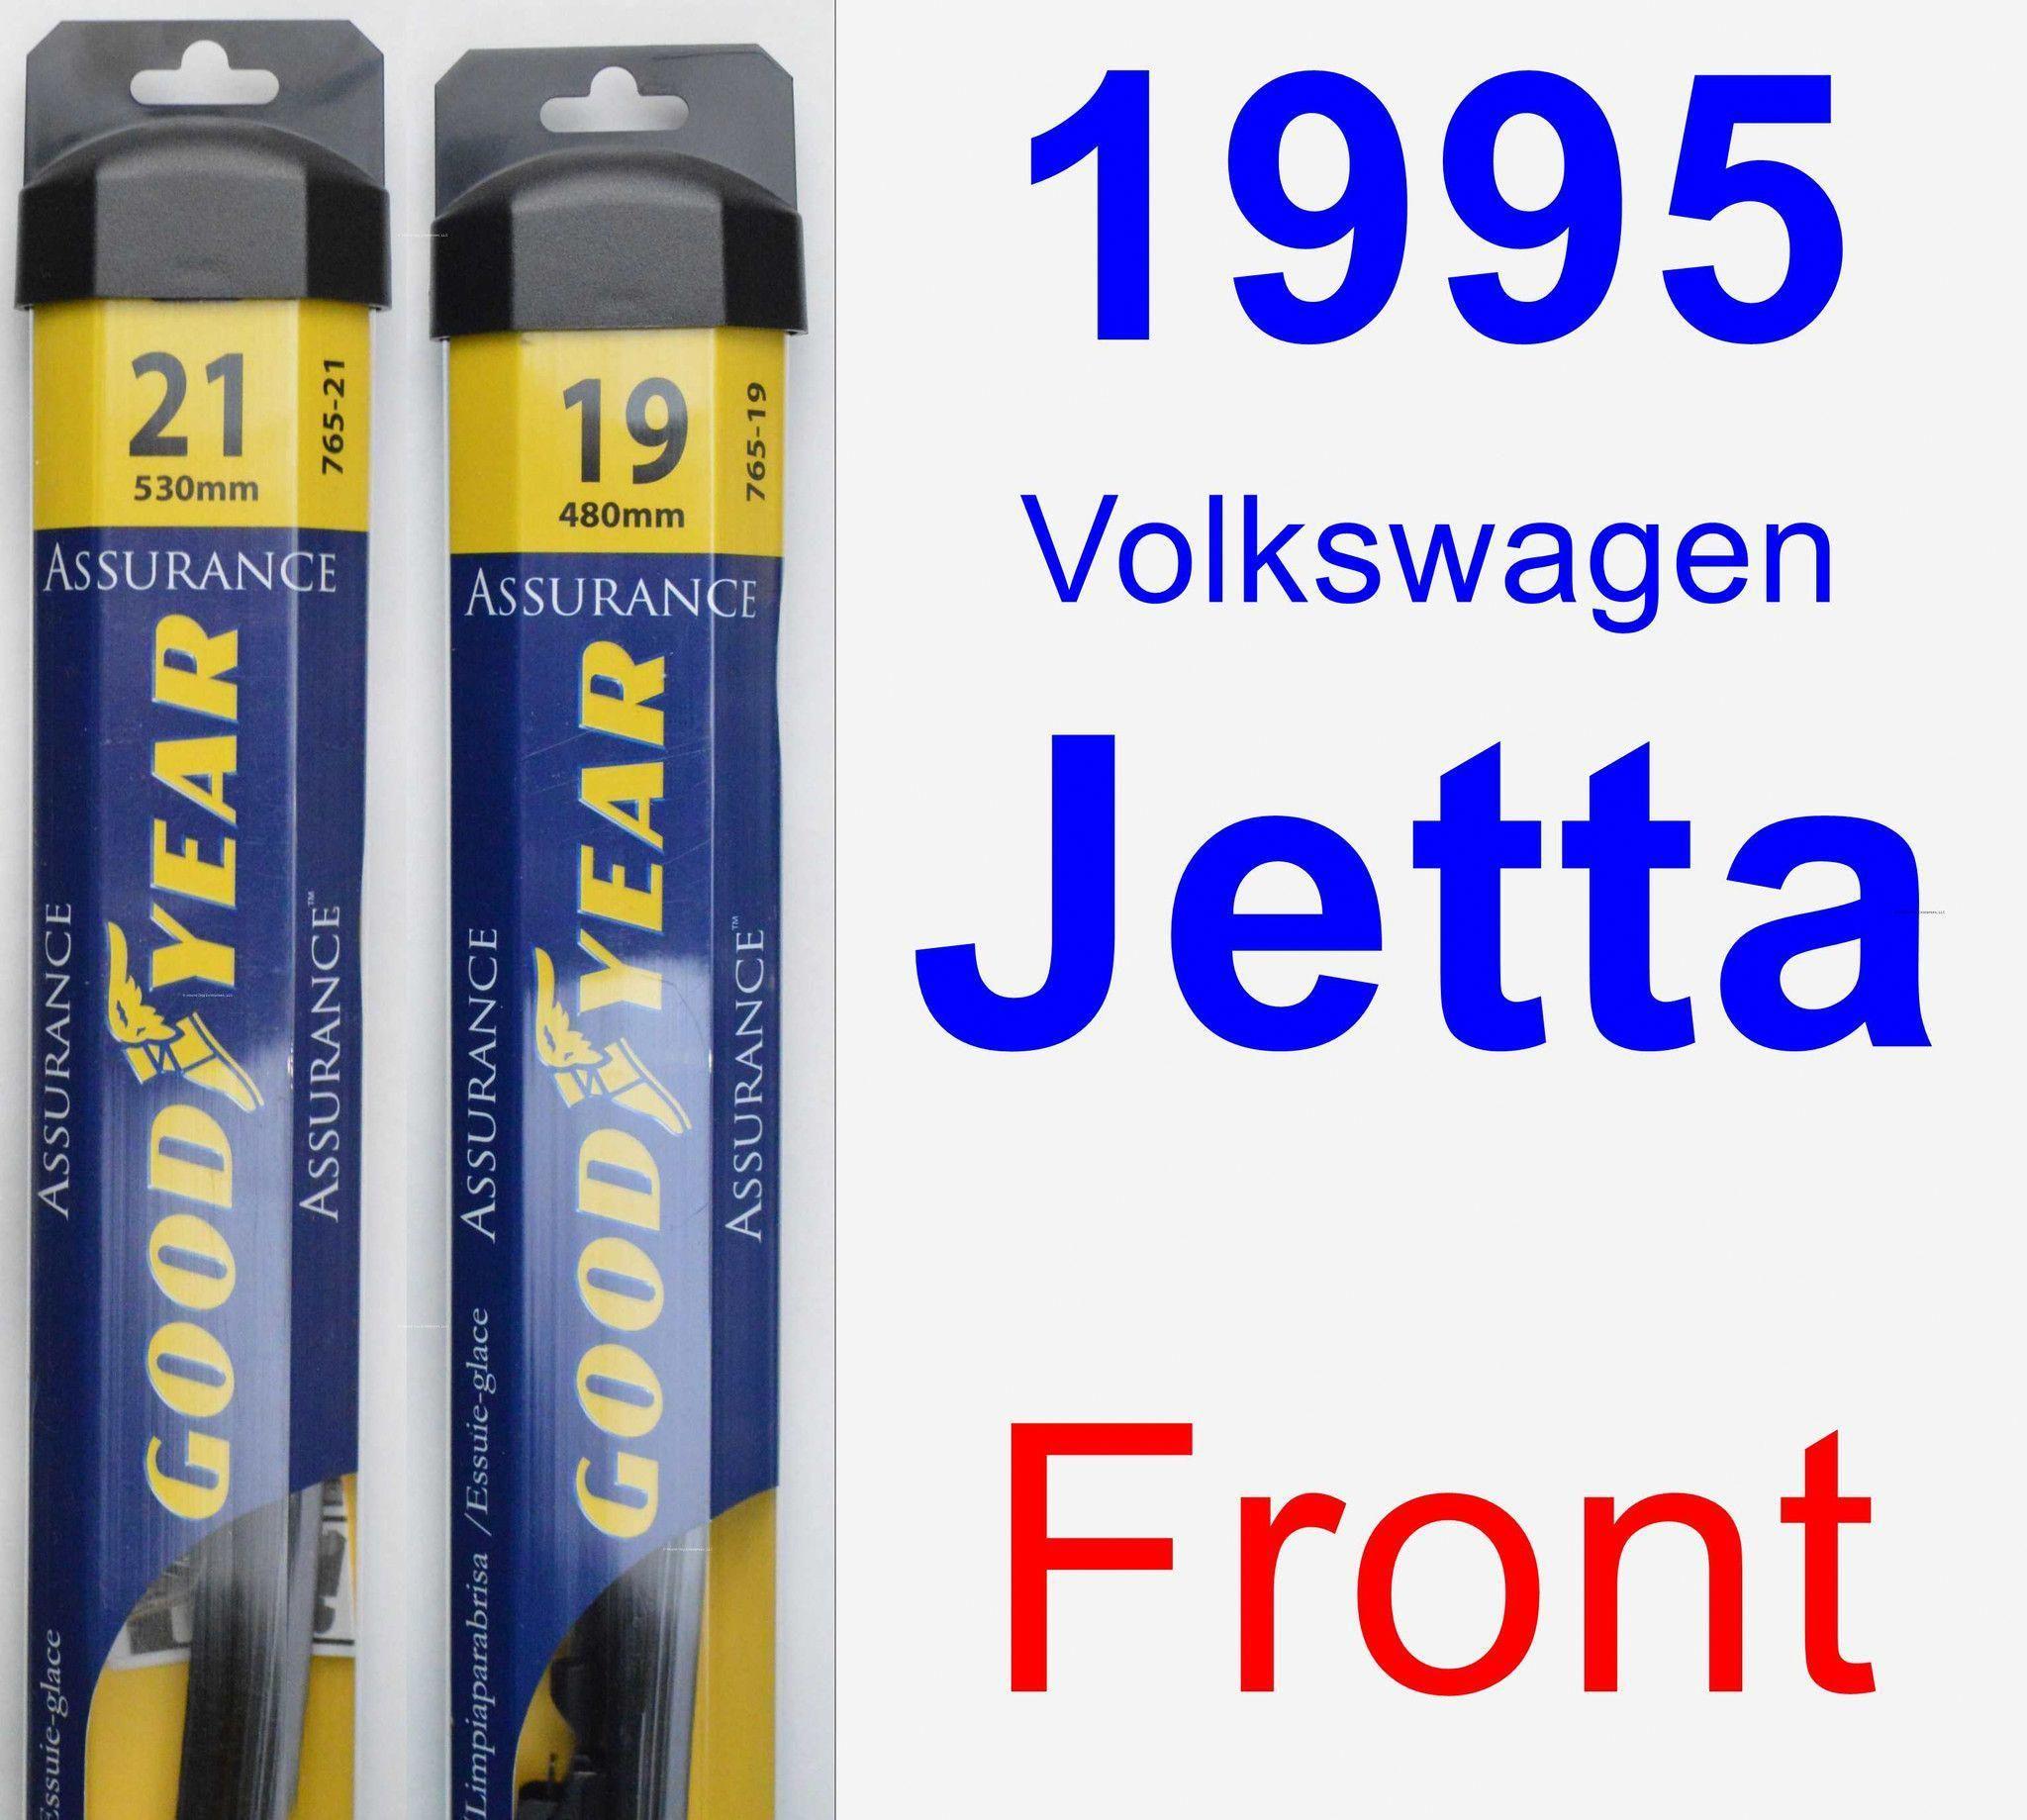 Front Wiper Blade Pack For 1995 Volkswagen Jetta Assurance Wiper Blades Car Windshield Wipers Subaru